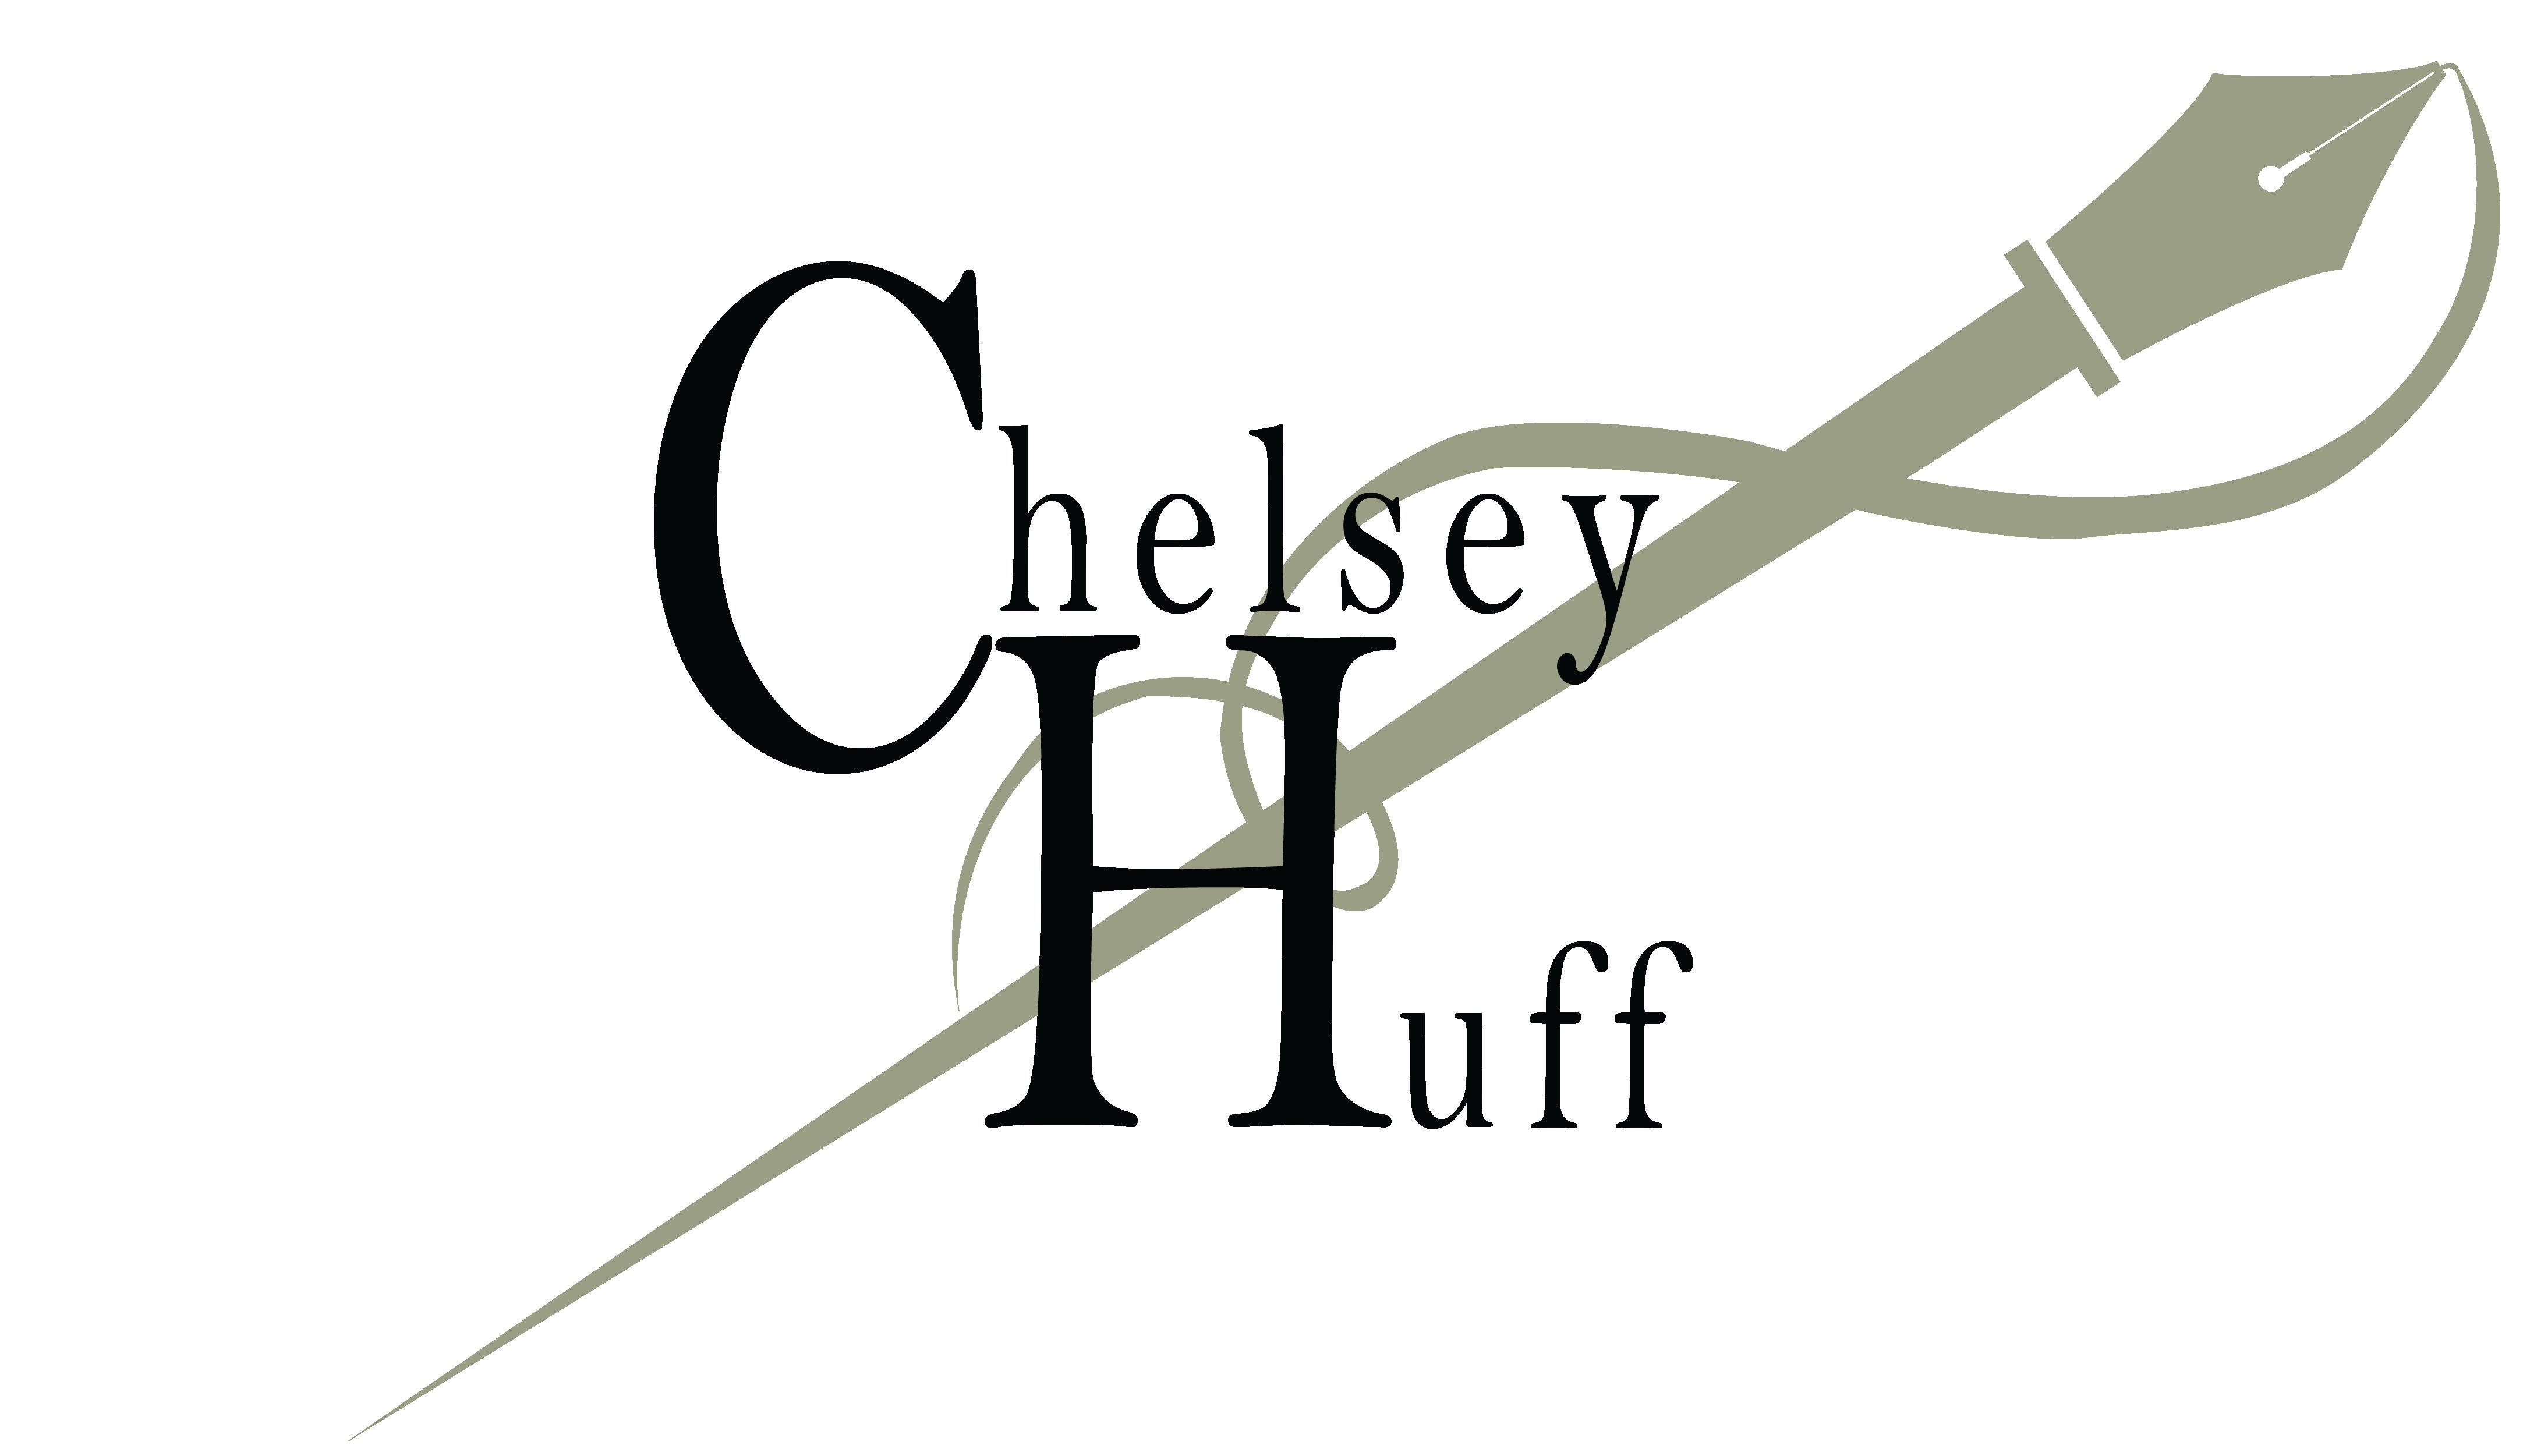 Chelsey Newell